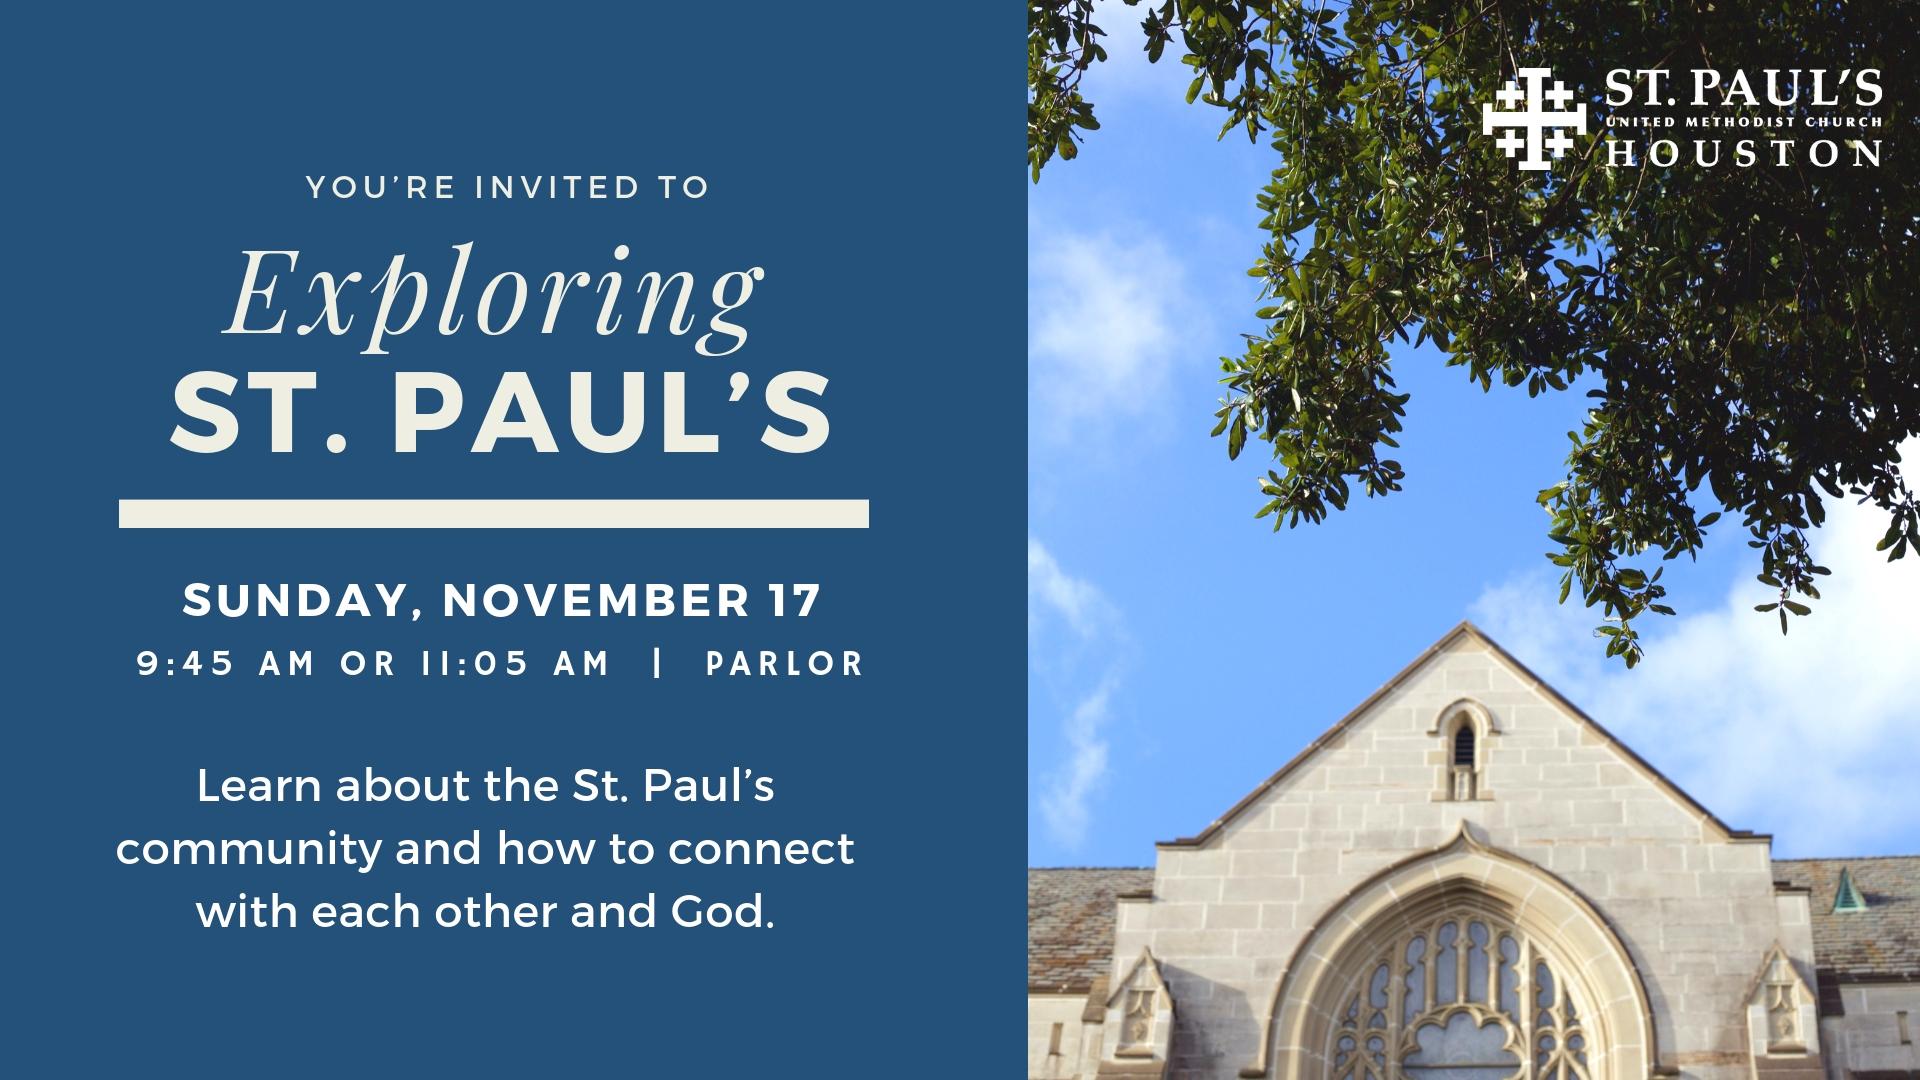 16x9 Exploring St. Paul's - Nov. 17, 2019.jpg